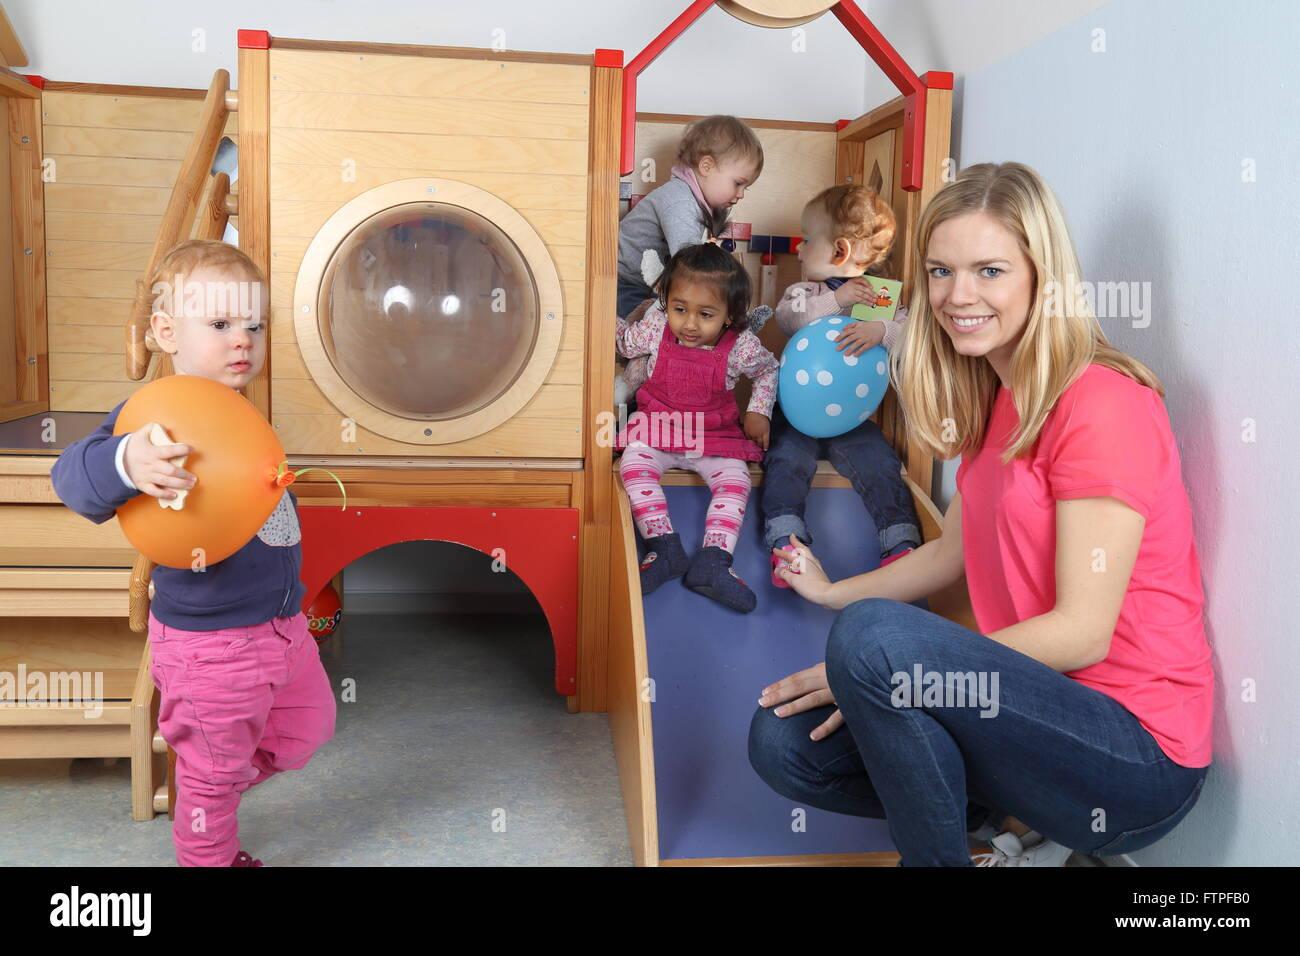 A Nursery nurse with 4 Kids on a indoor slide - Stock Image